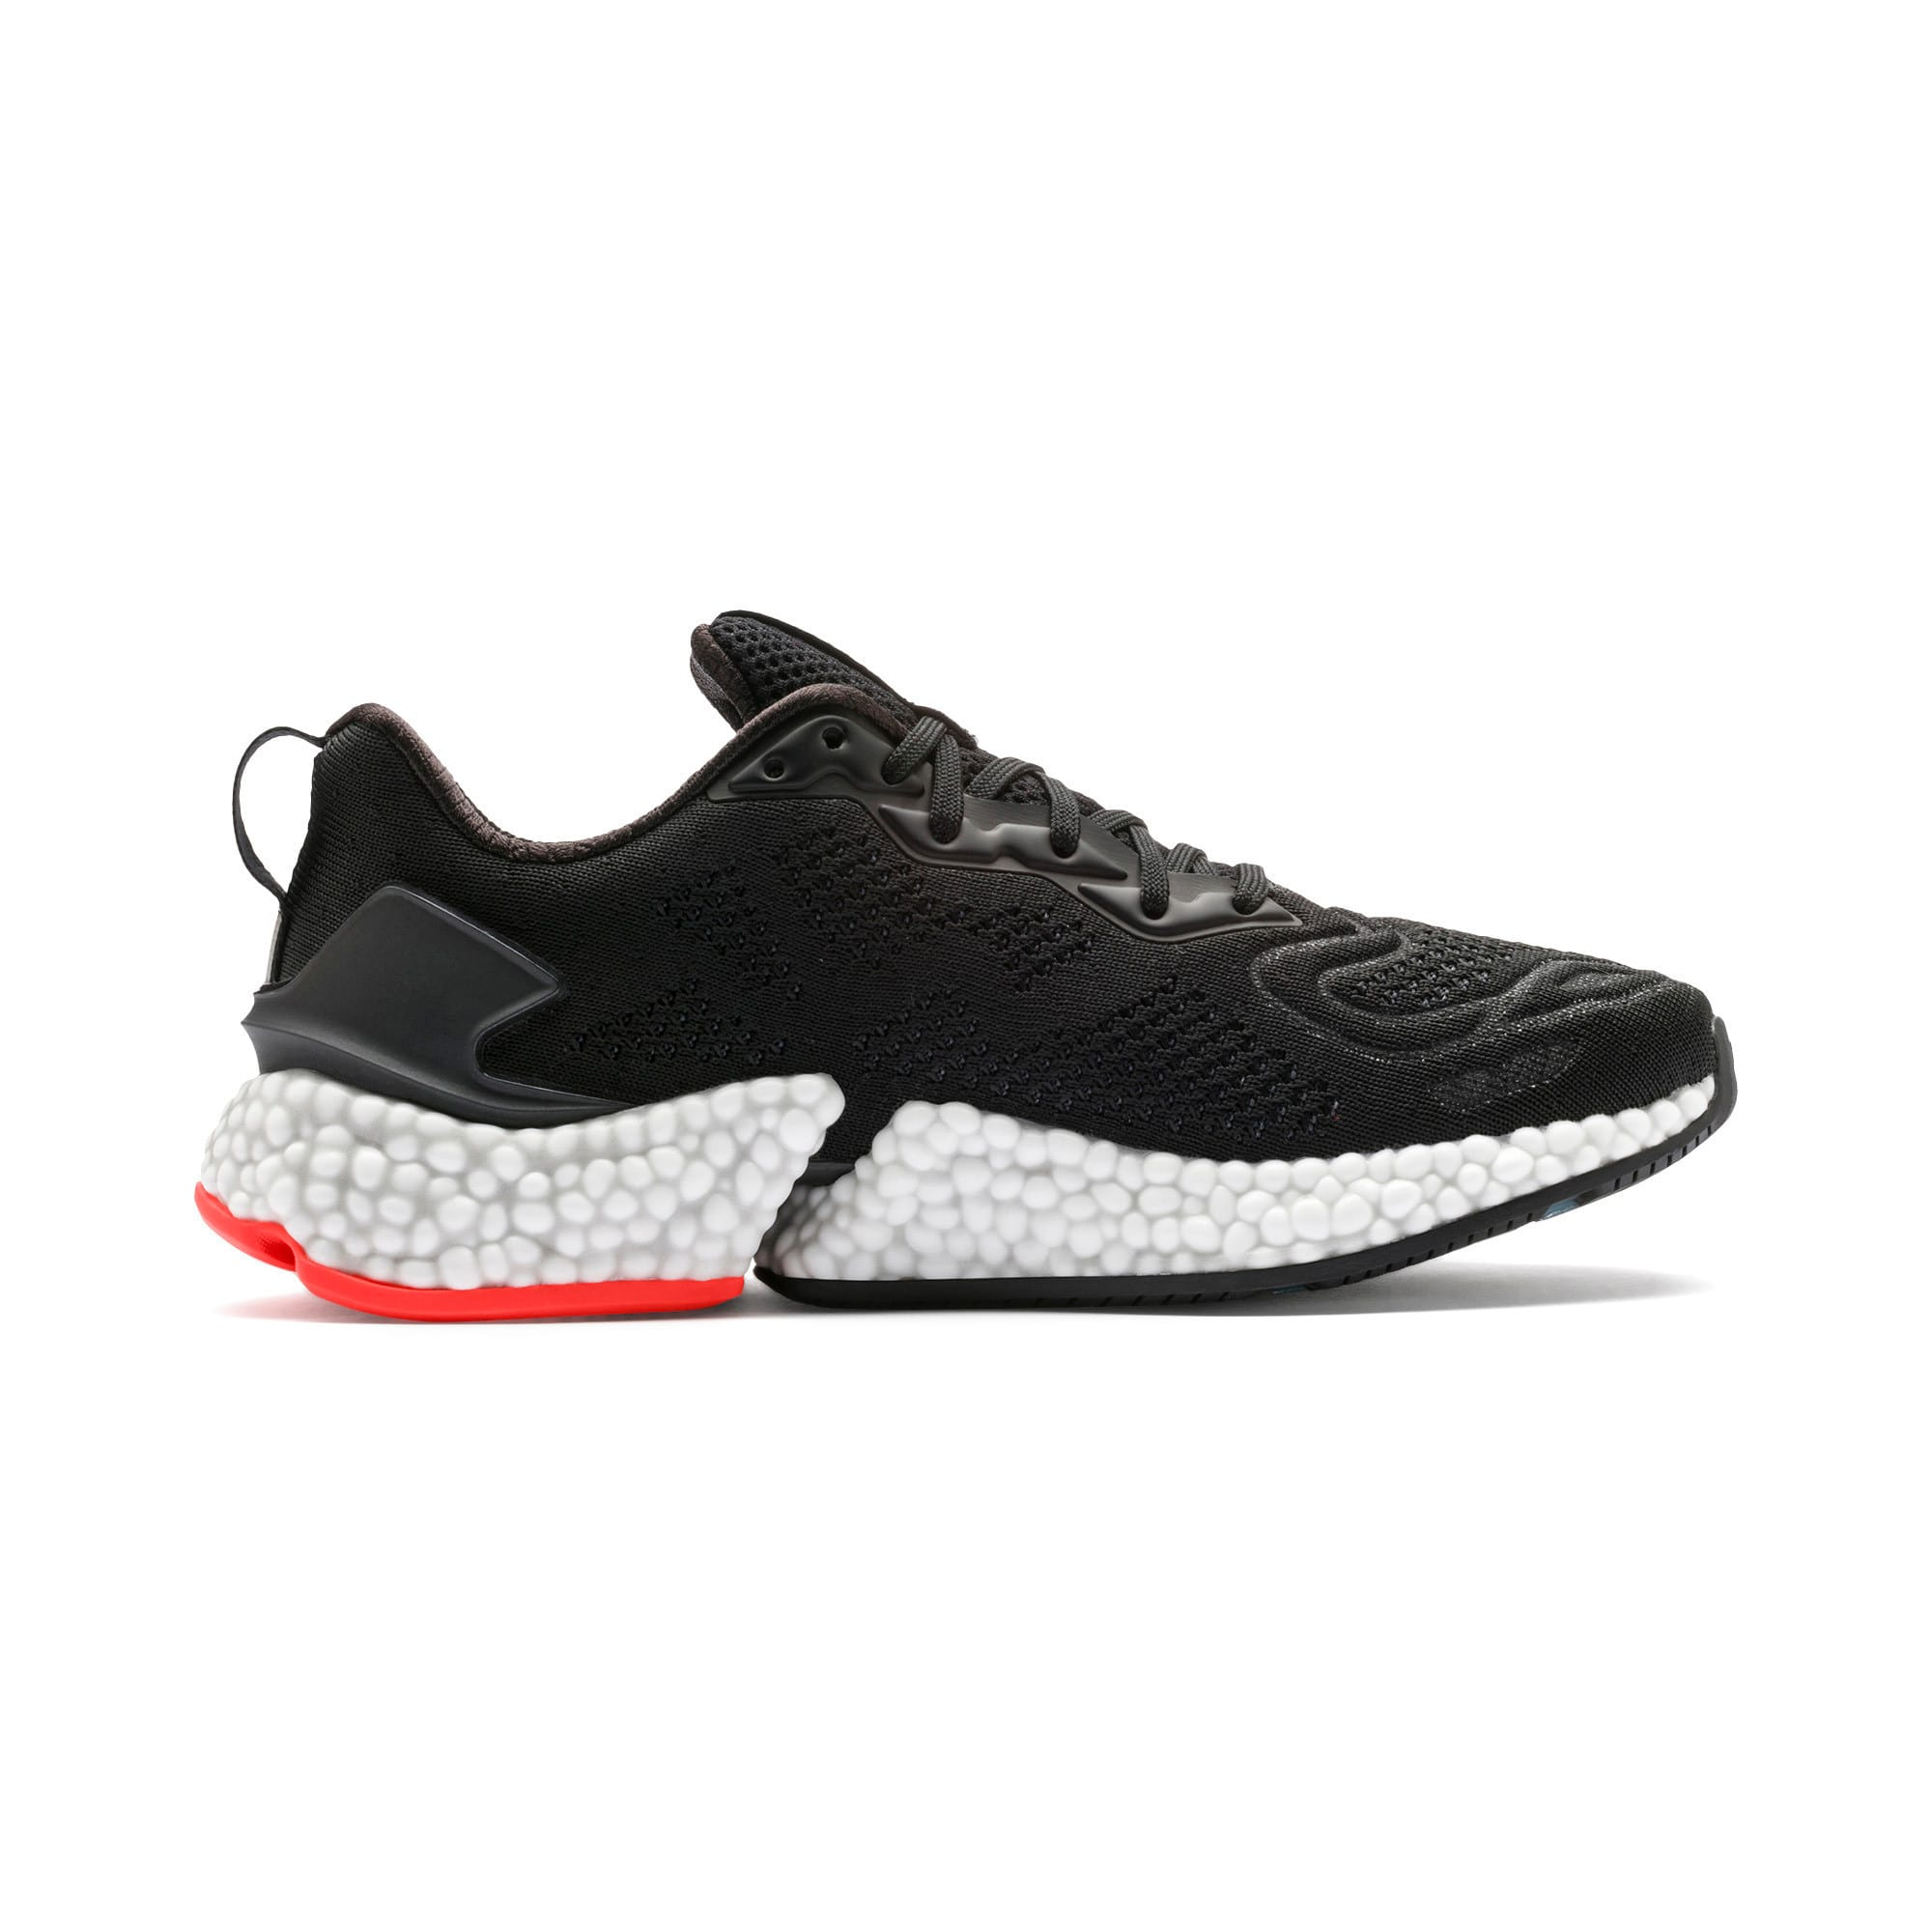 Miniatura 6 de Zapatos para correr SPEED Orbiter para mujer, Black-Red-Milky Blue-White, mediano